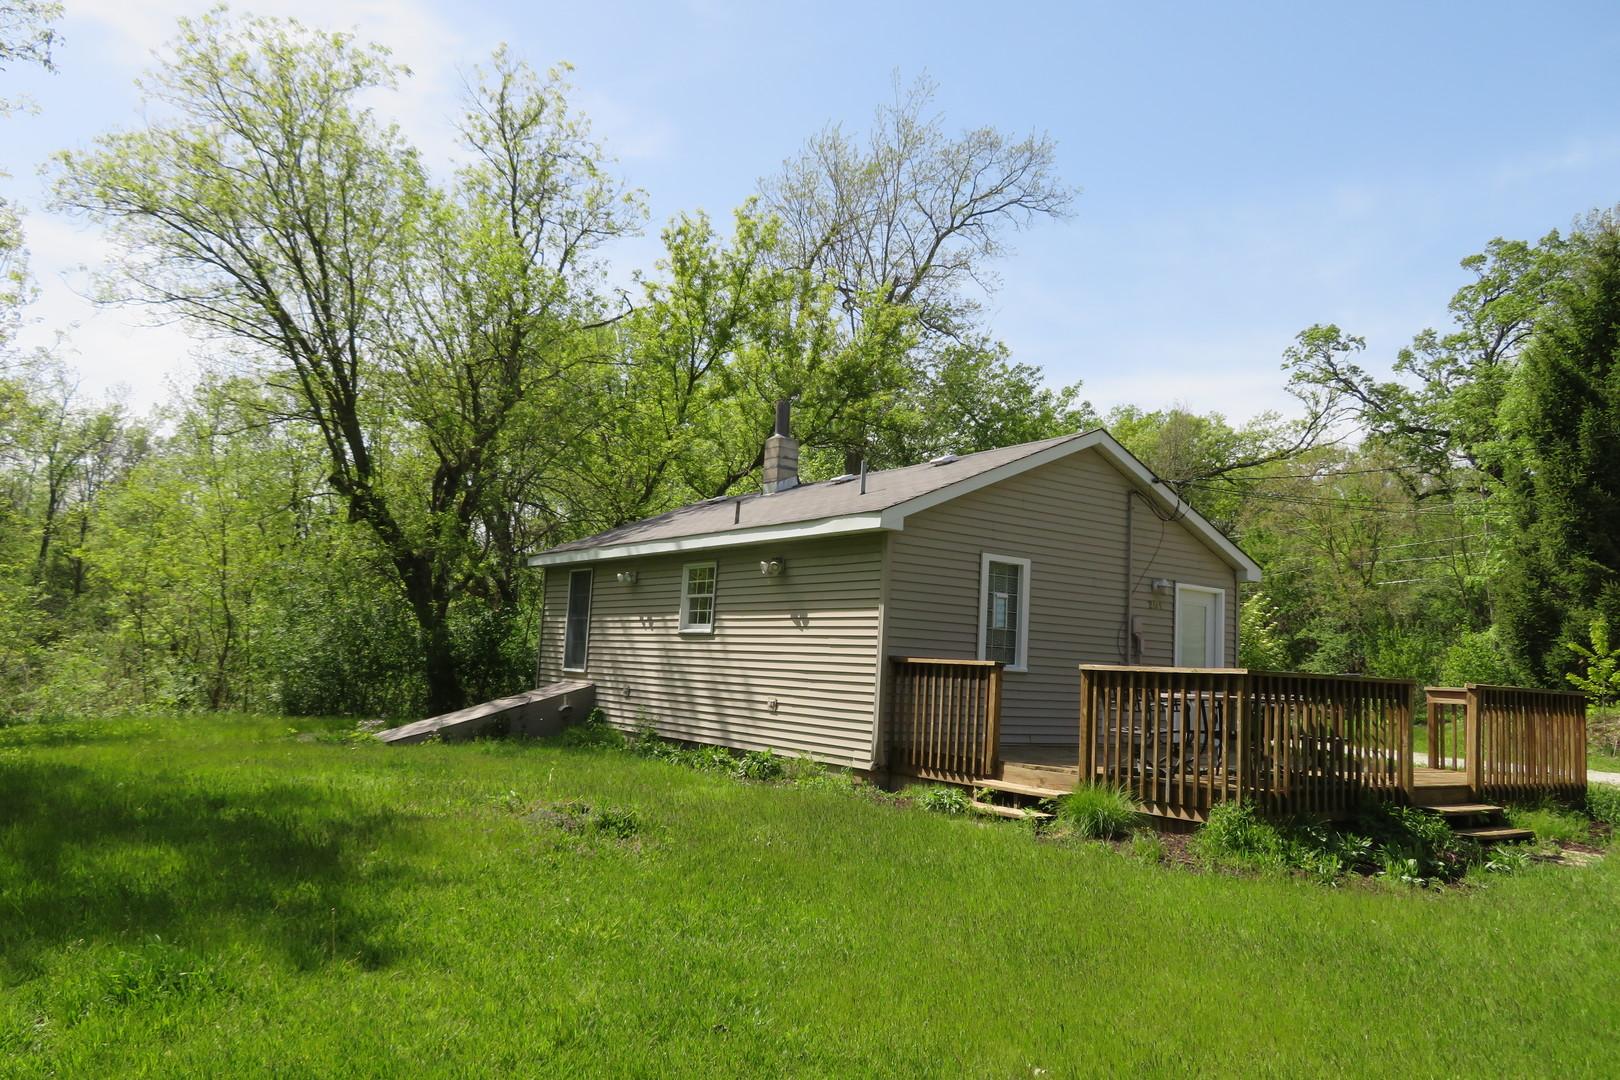 201 West Grass Lake, Spring Grove, Illinois, 60081